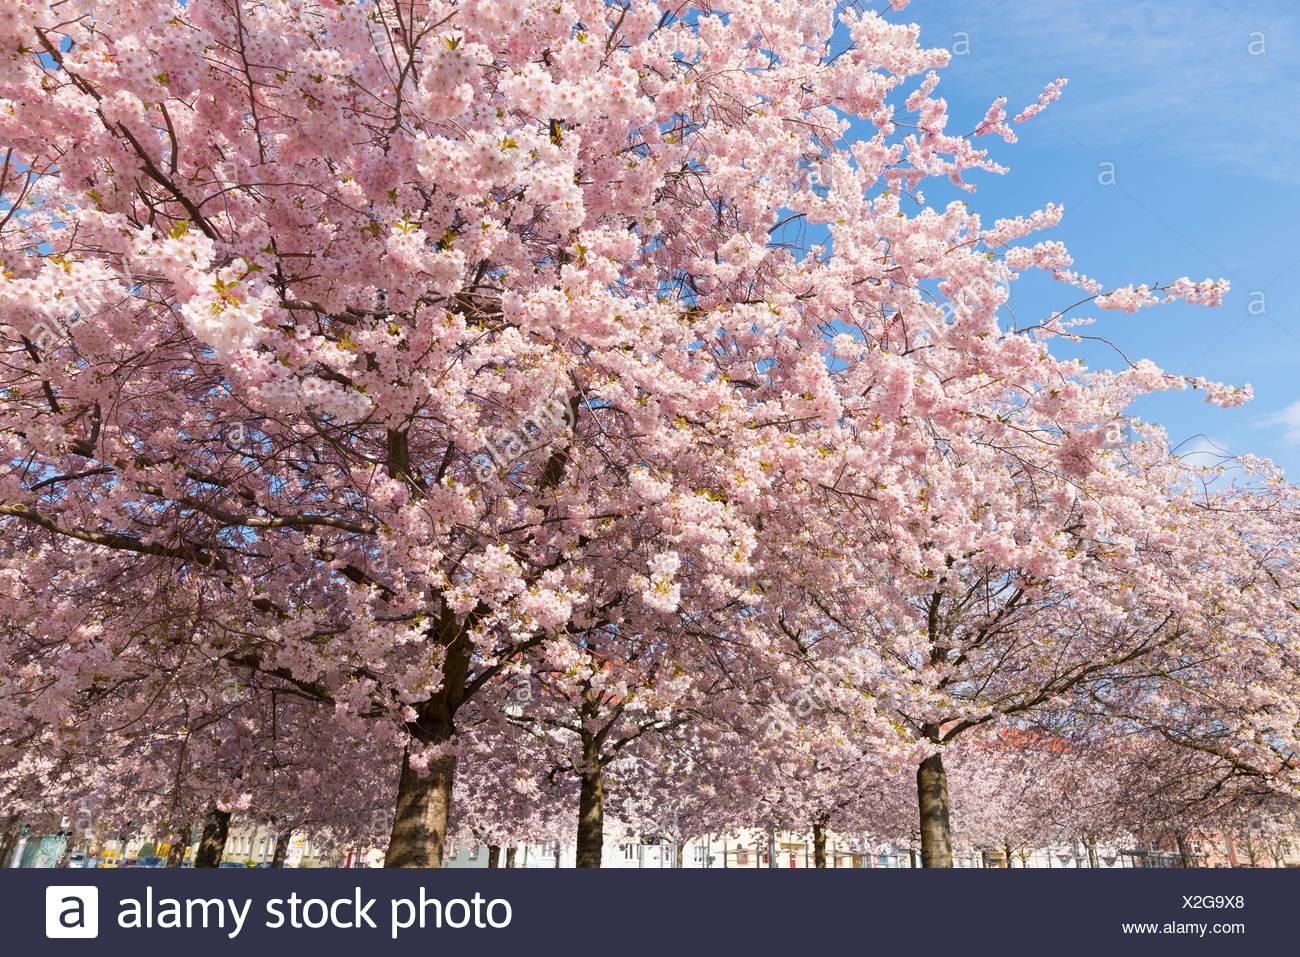 Japanese cherry (Prunus serrulata) in blossom, Erfurt, Thuringia, Germany - Stock Image